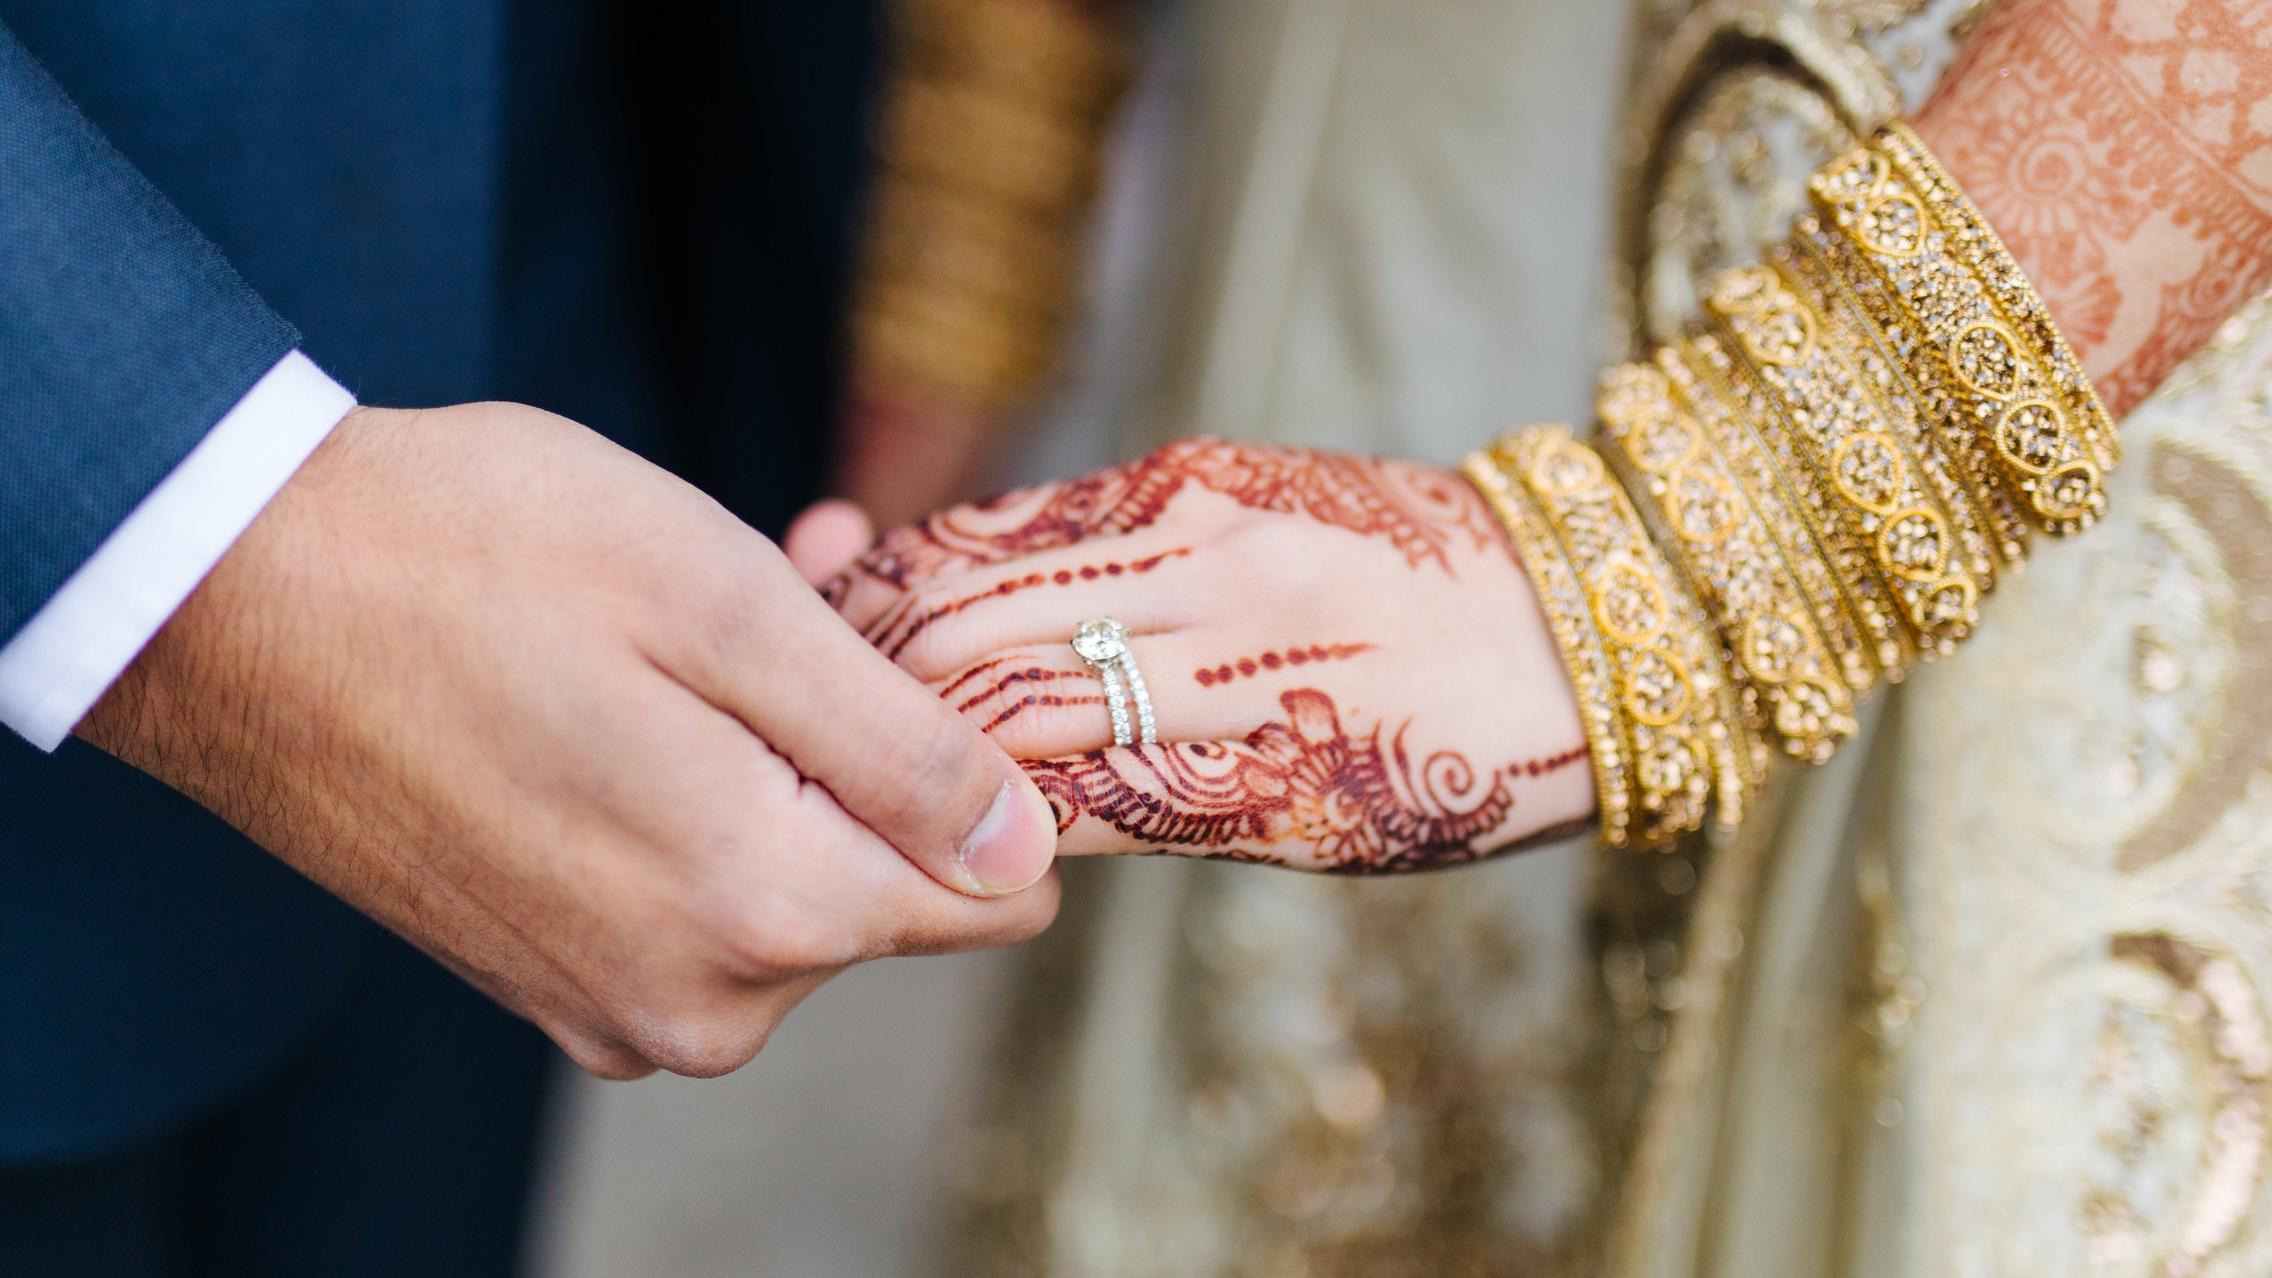 herastudios_wedding2_danica_sanjeev_collectors_package-11.jpg